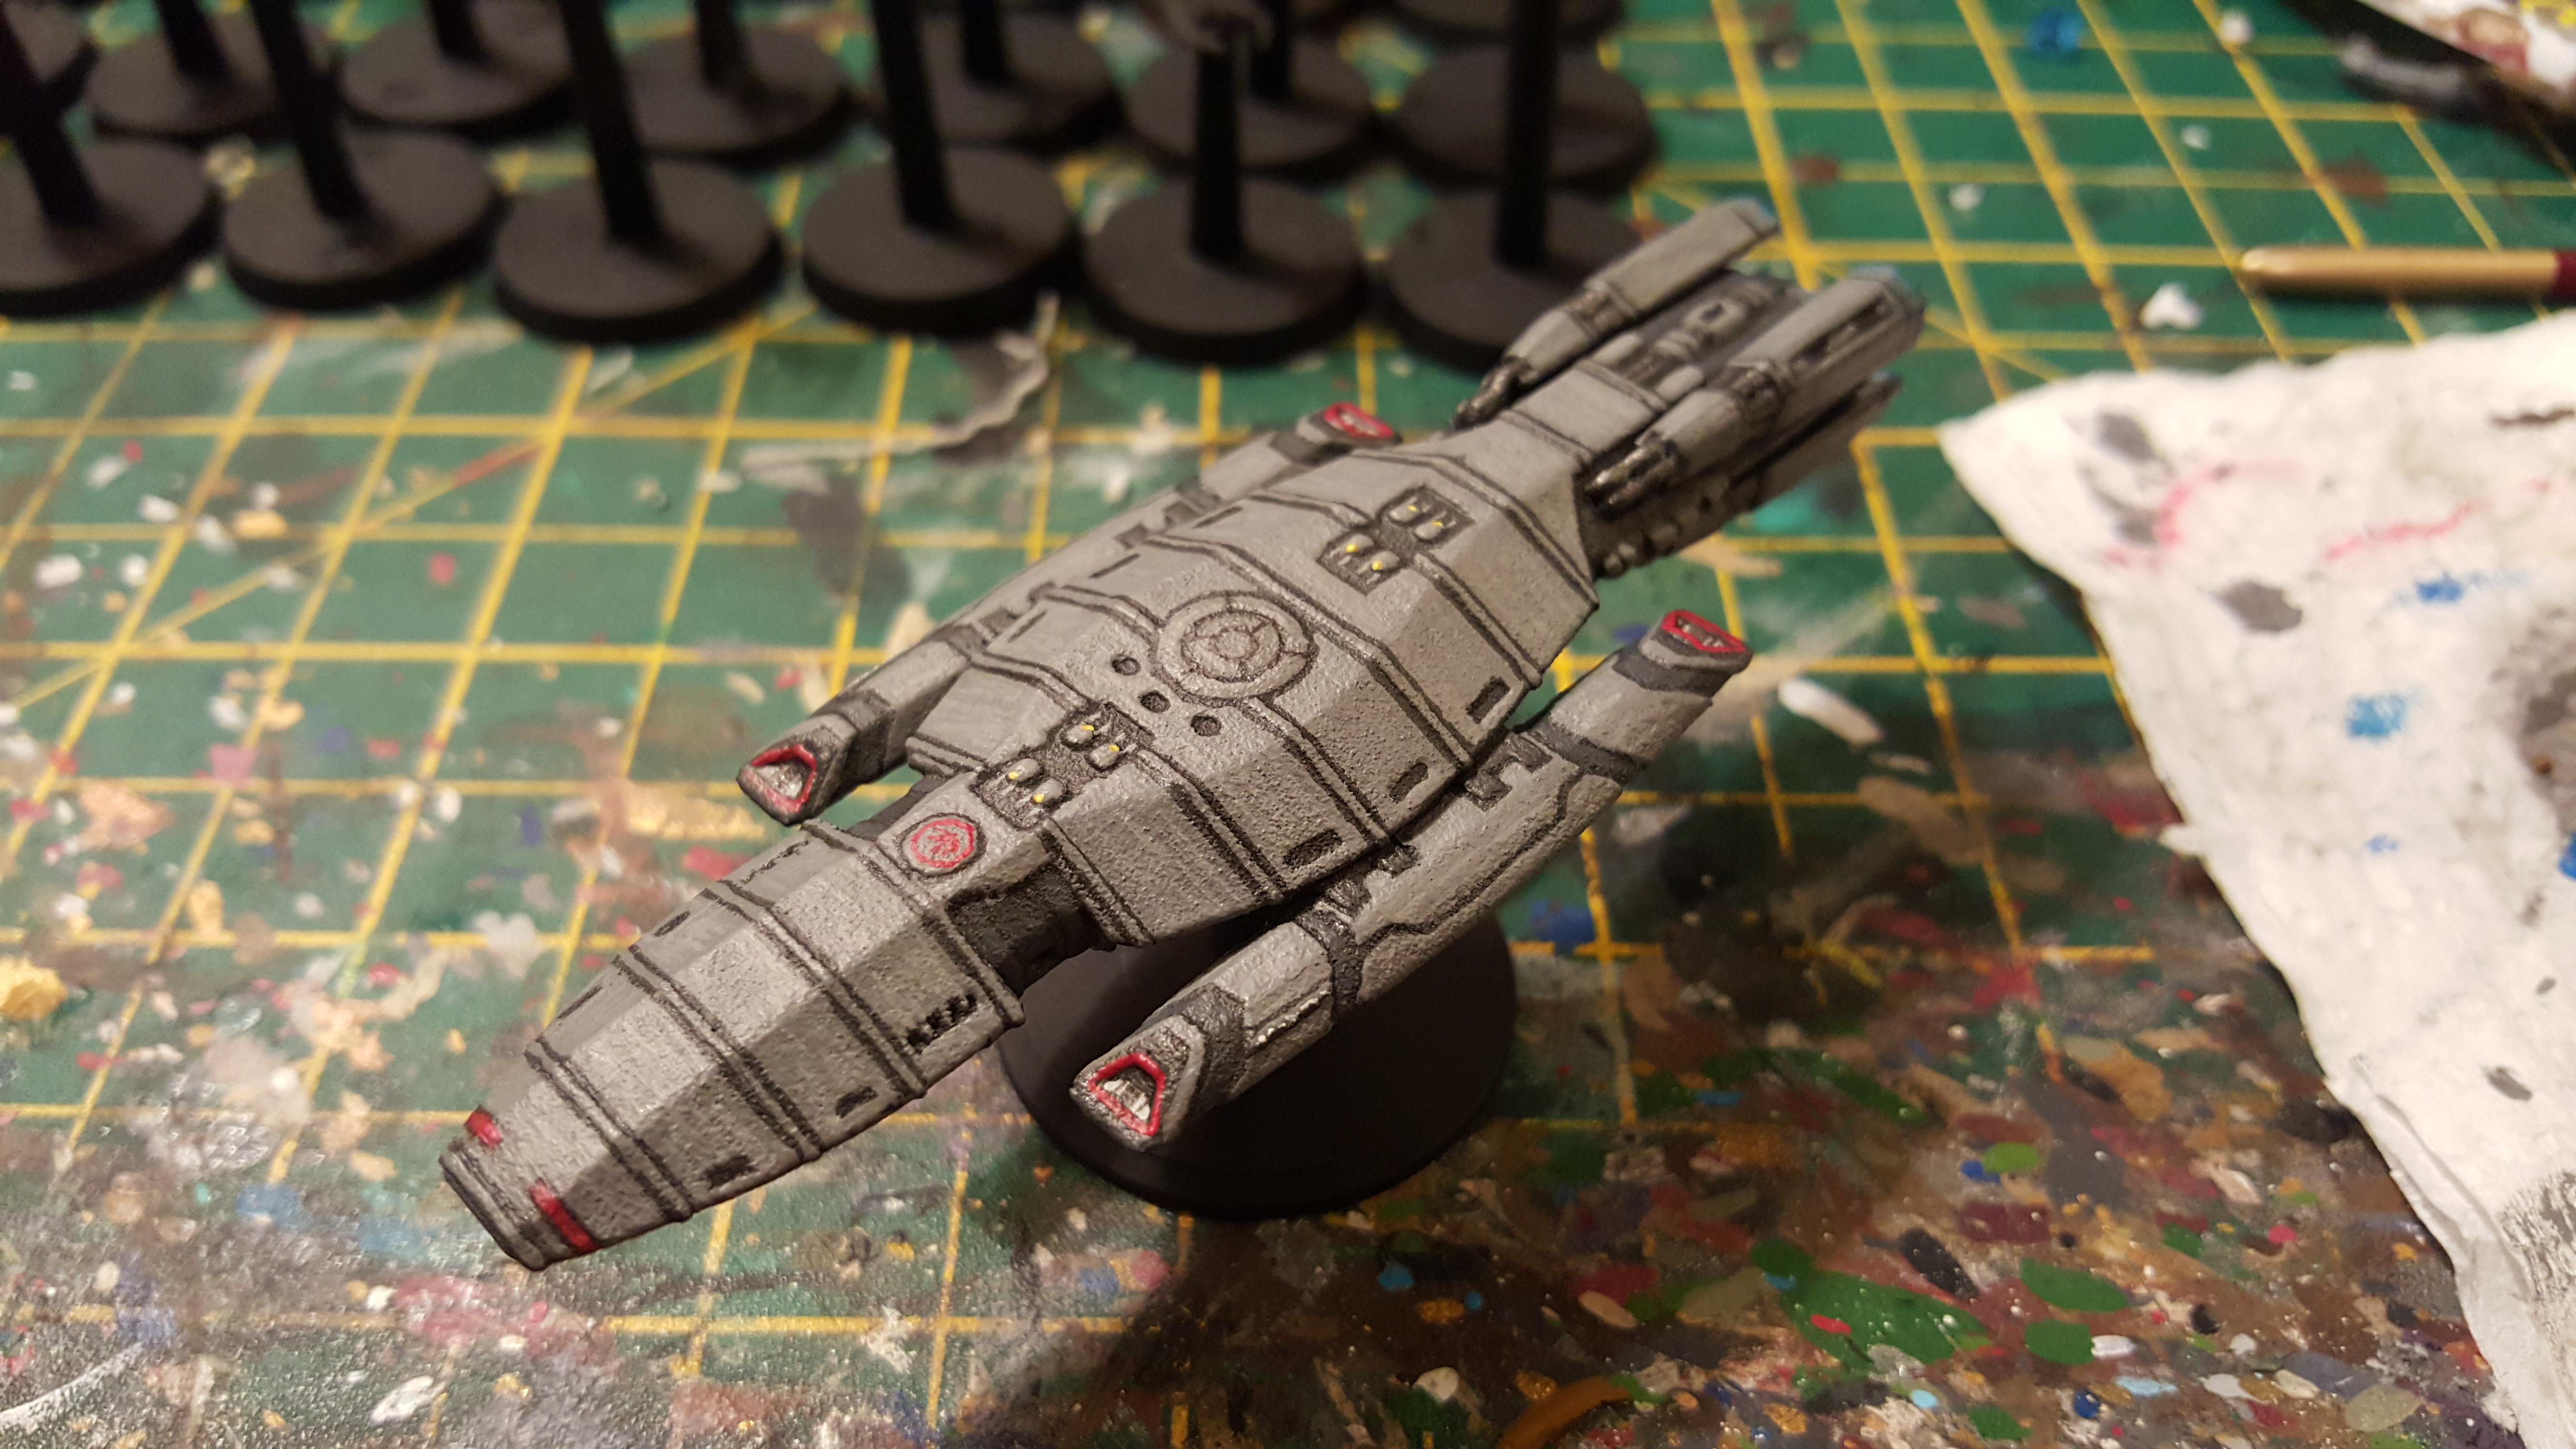 Battlestar, Battlestar Galactica, Space Ship, Stealth